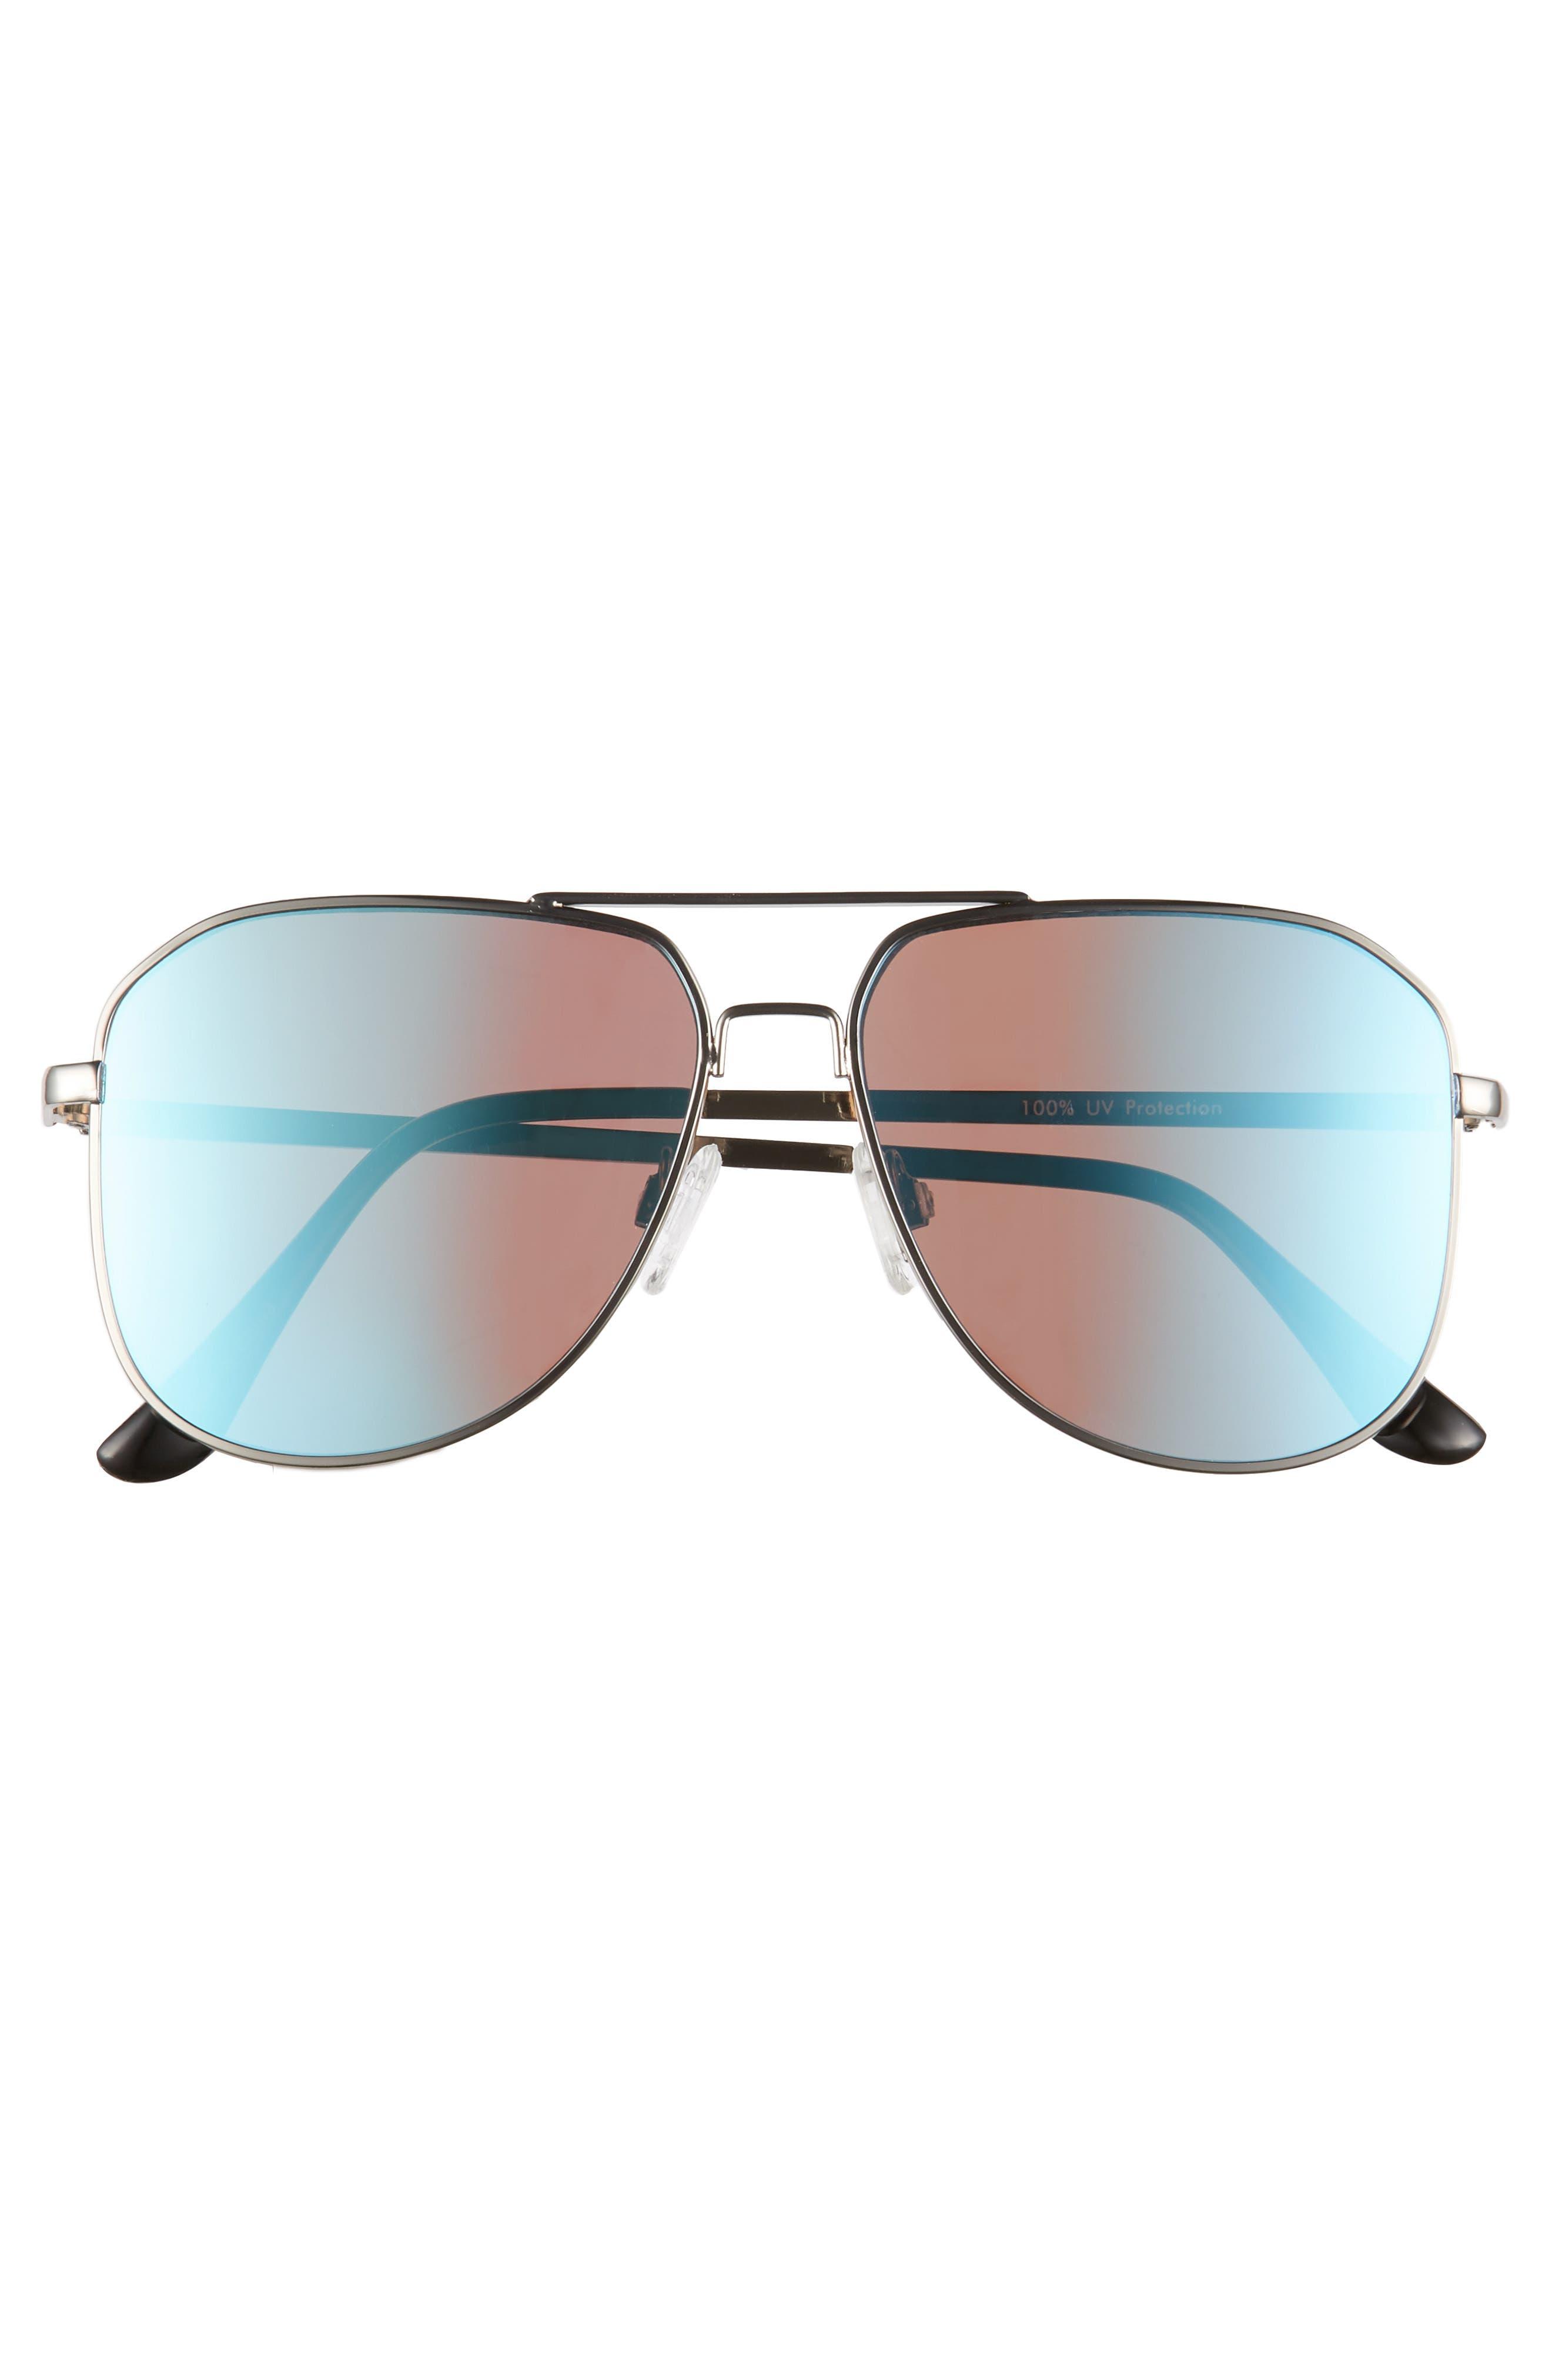 54mm Aviator Sunglasses,                             Alternate thumbnail 3, color,                             040